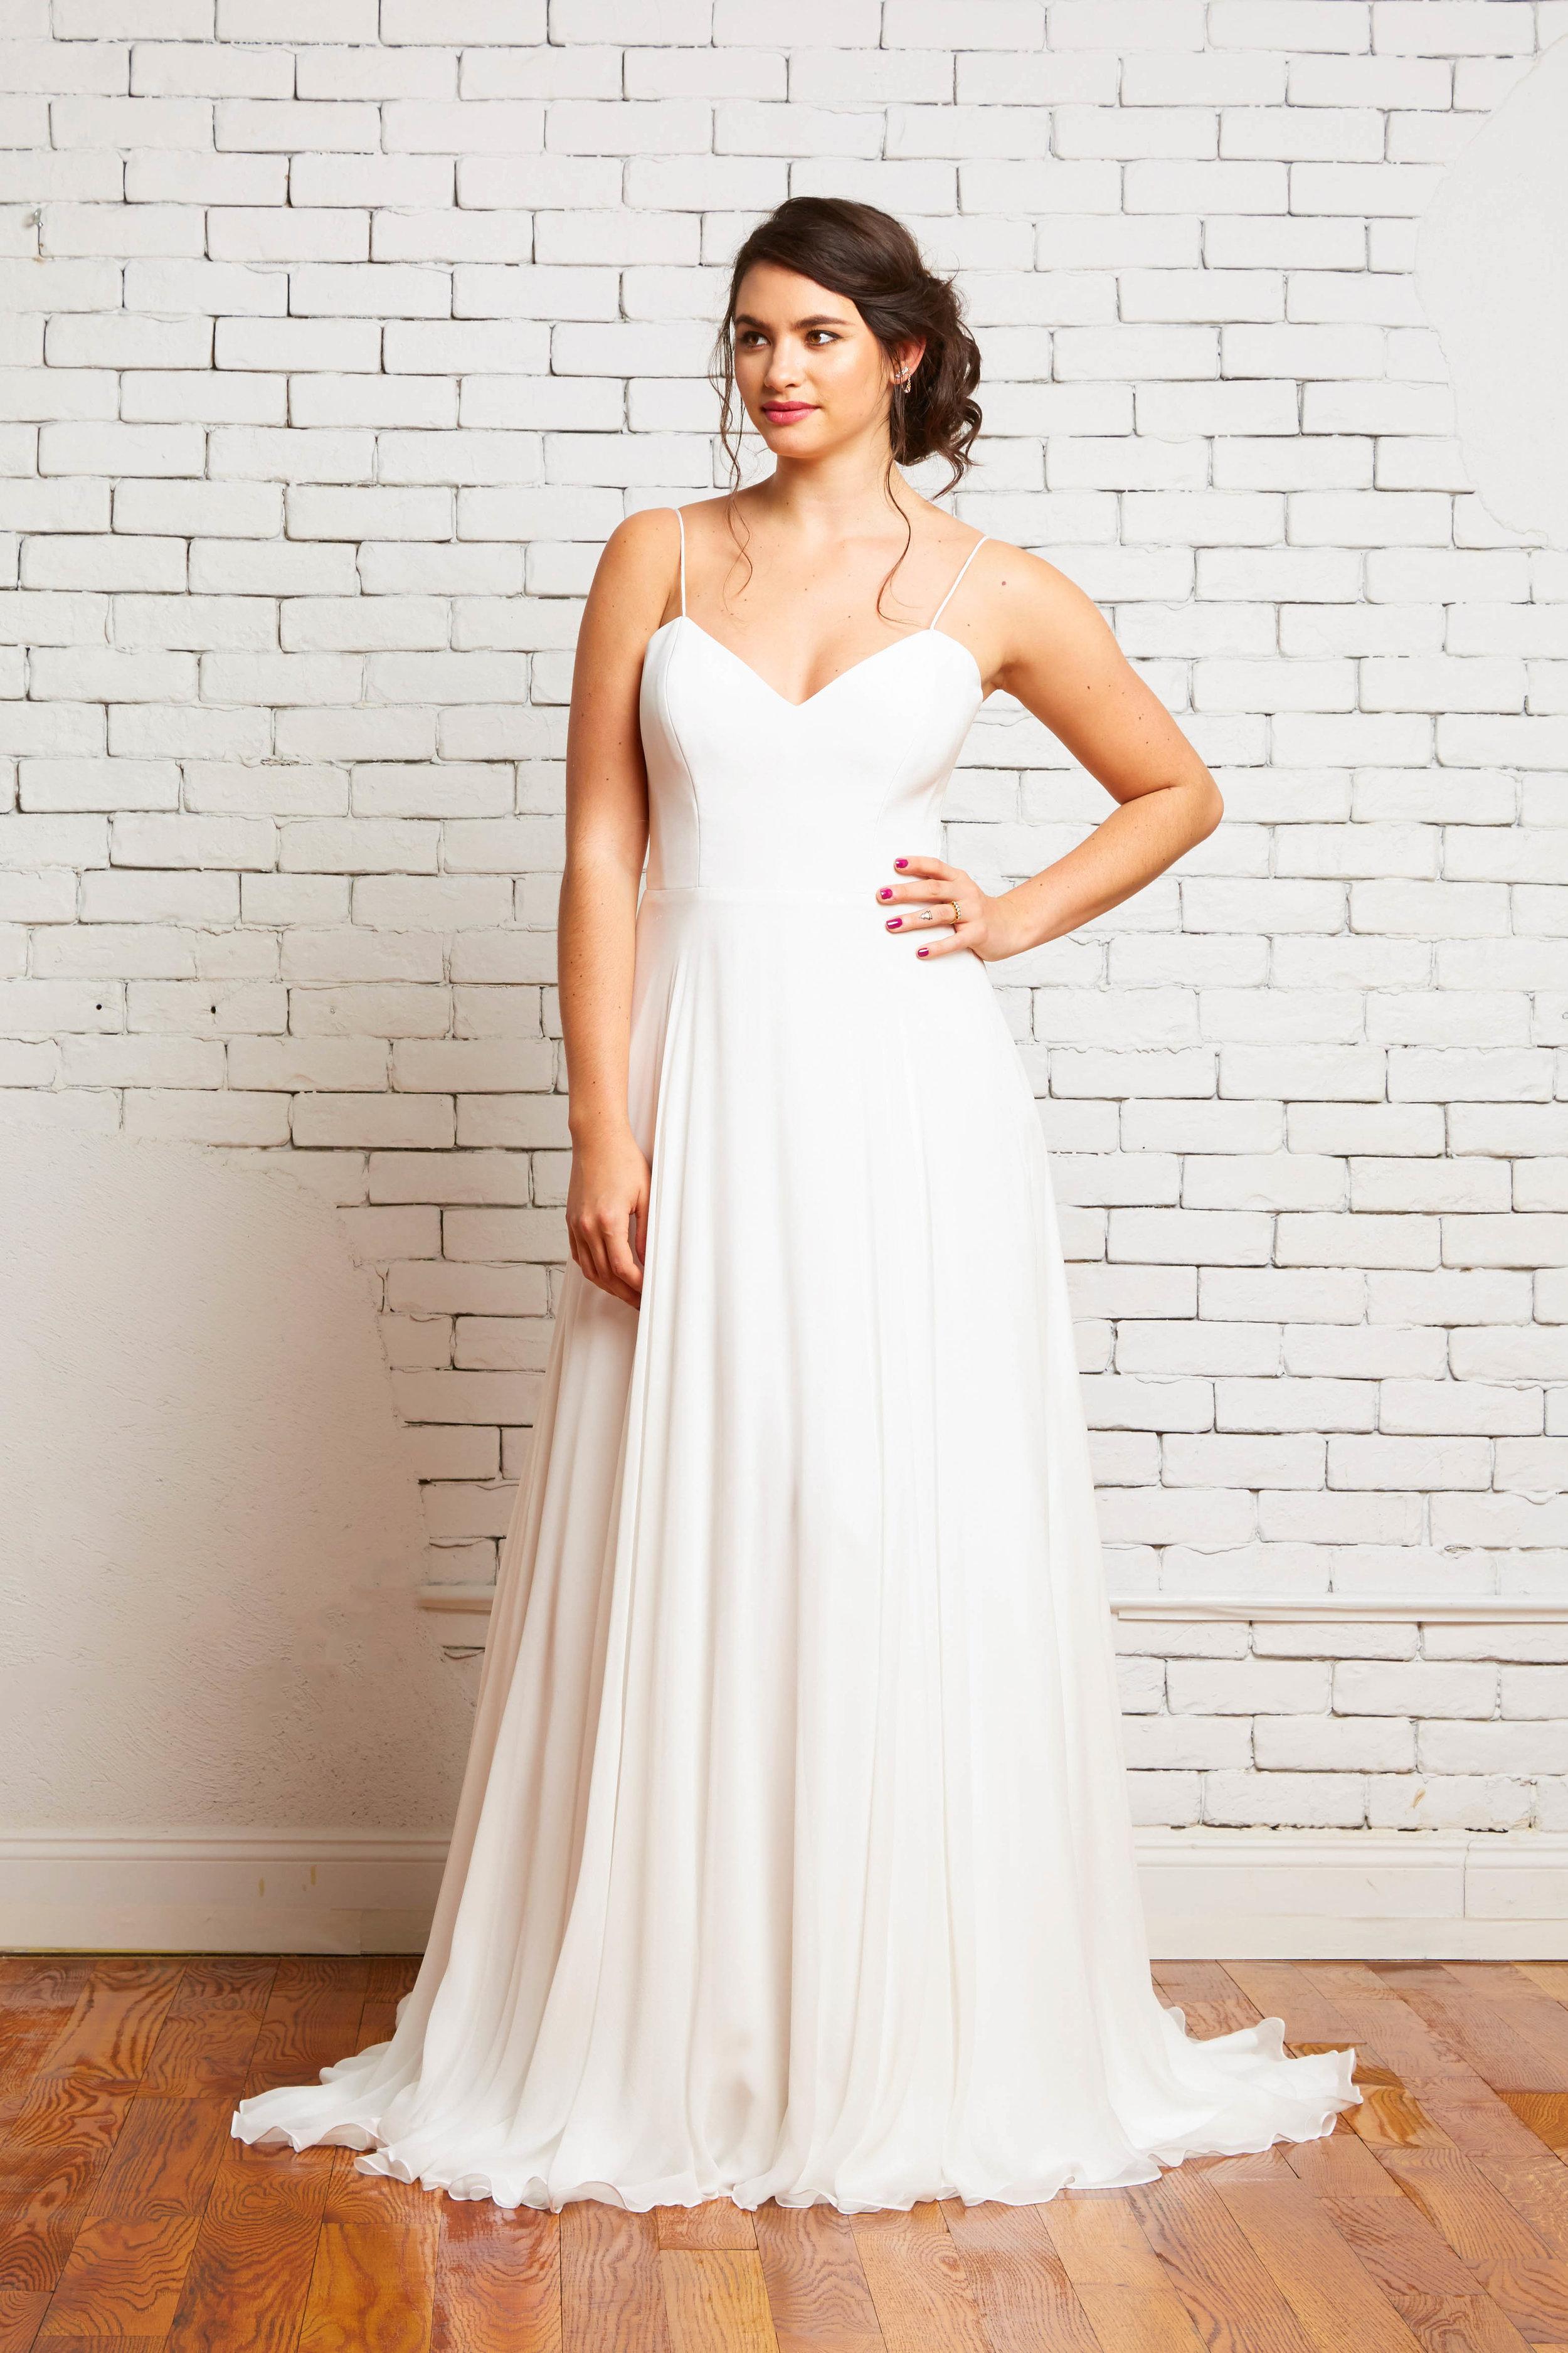 3A. Daisy Front-Rebecca Schoneveld-2-103_simple_silk_chiffon_a_line_gown.jpg